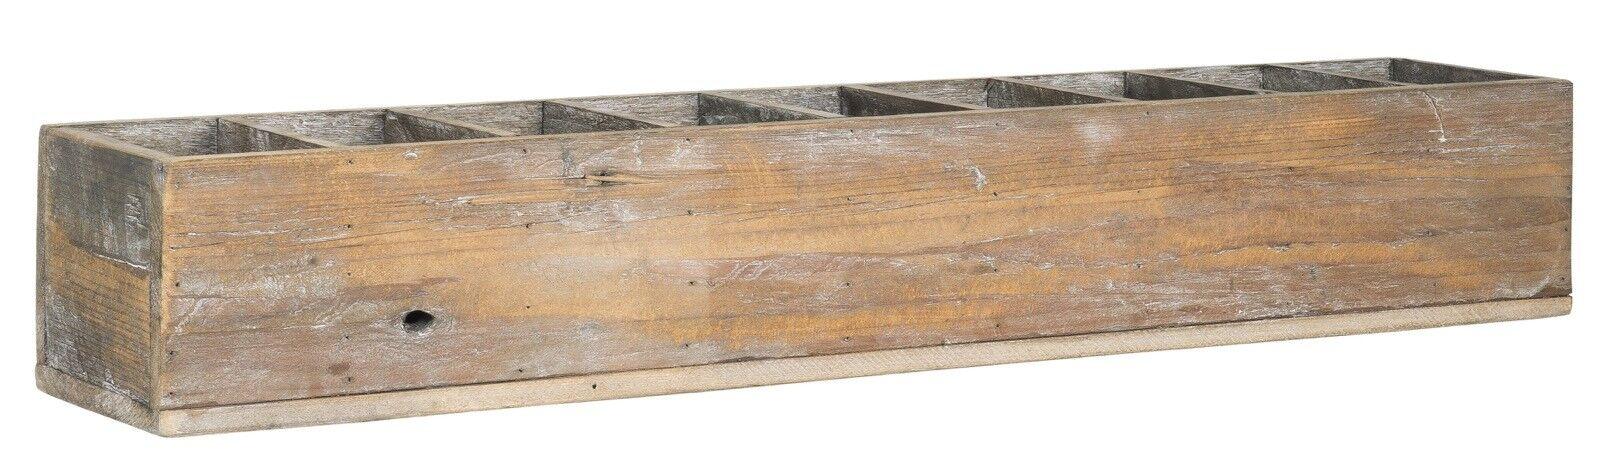 Großer Holzkasten  9 Fächer Holz braun natur  Dekokasten IB Laursen